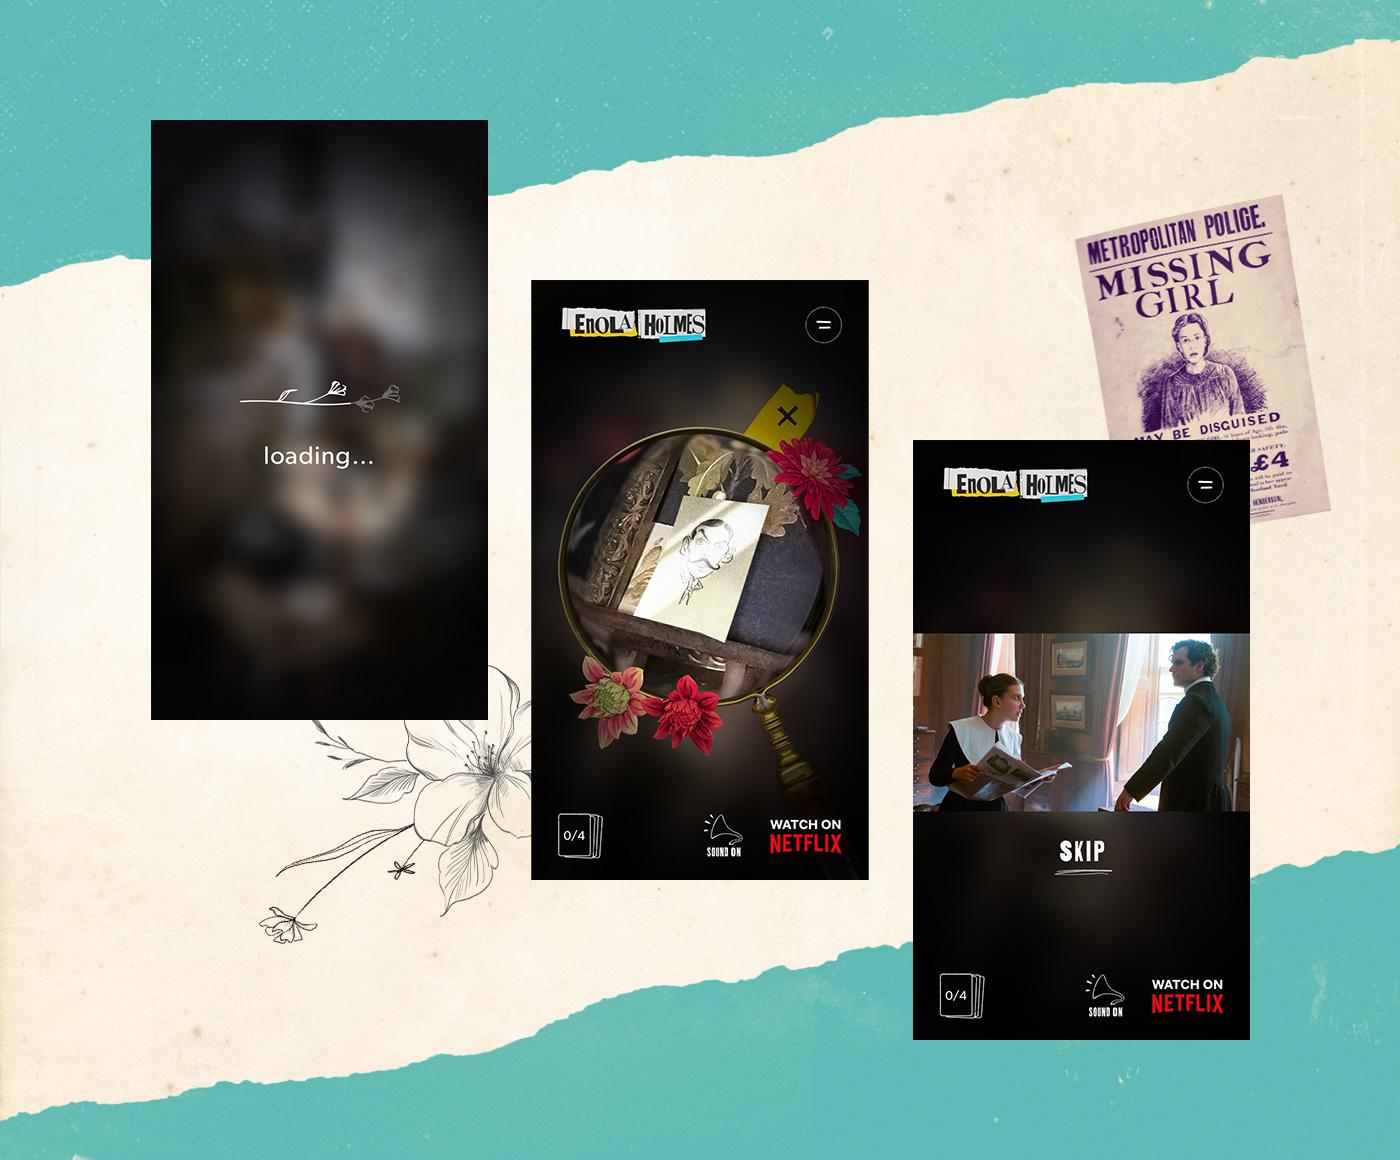 Website,digital,interactive,movie,UI,Netflix,Entertainment